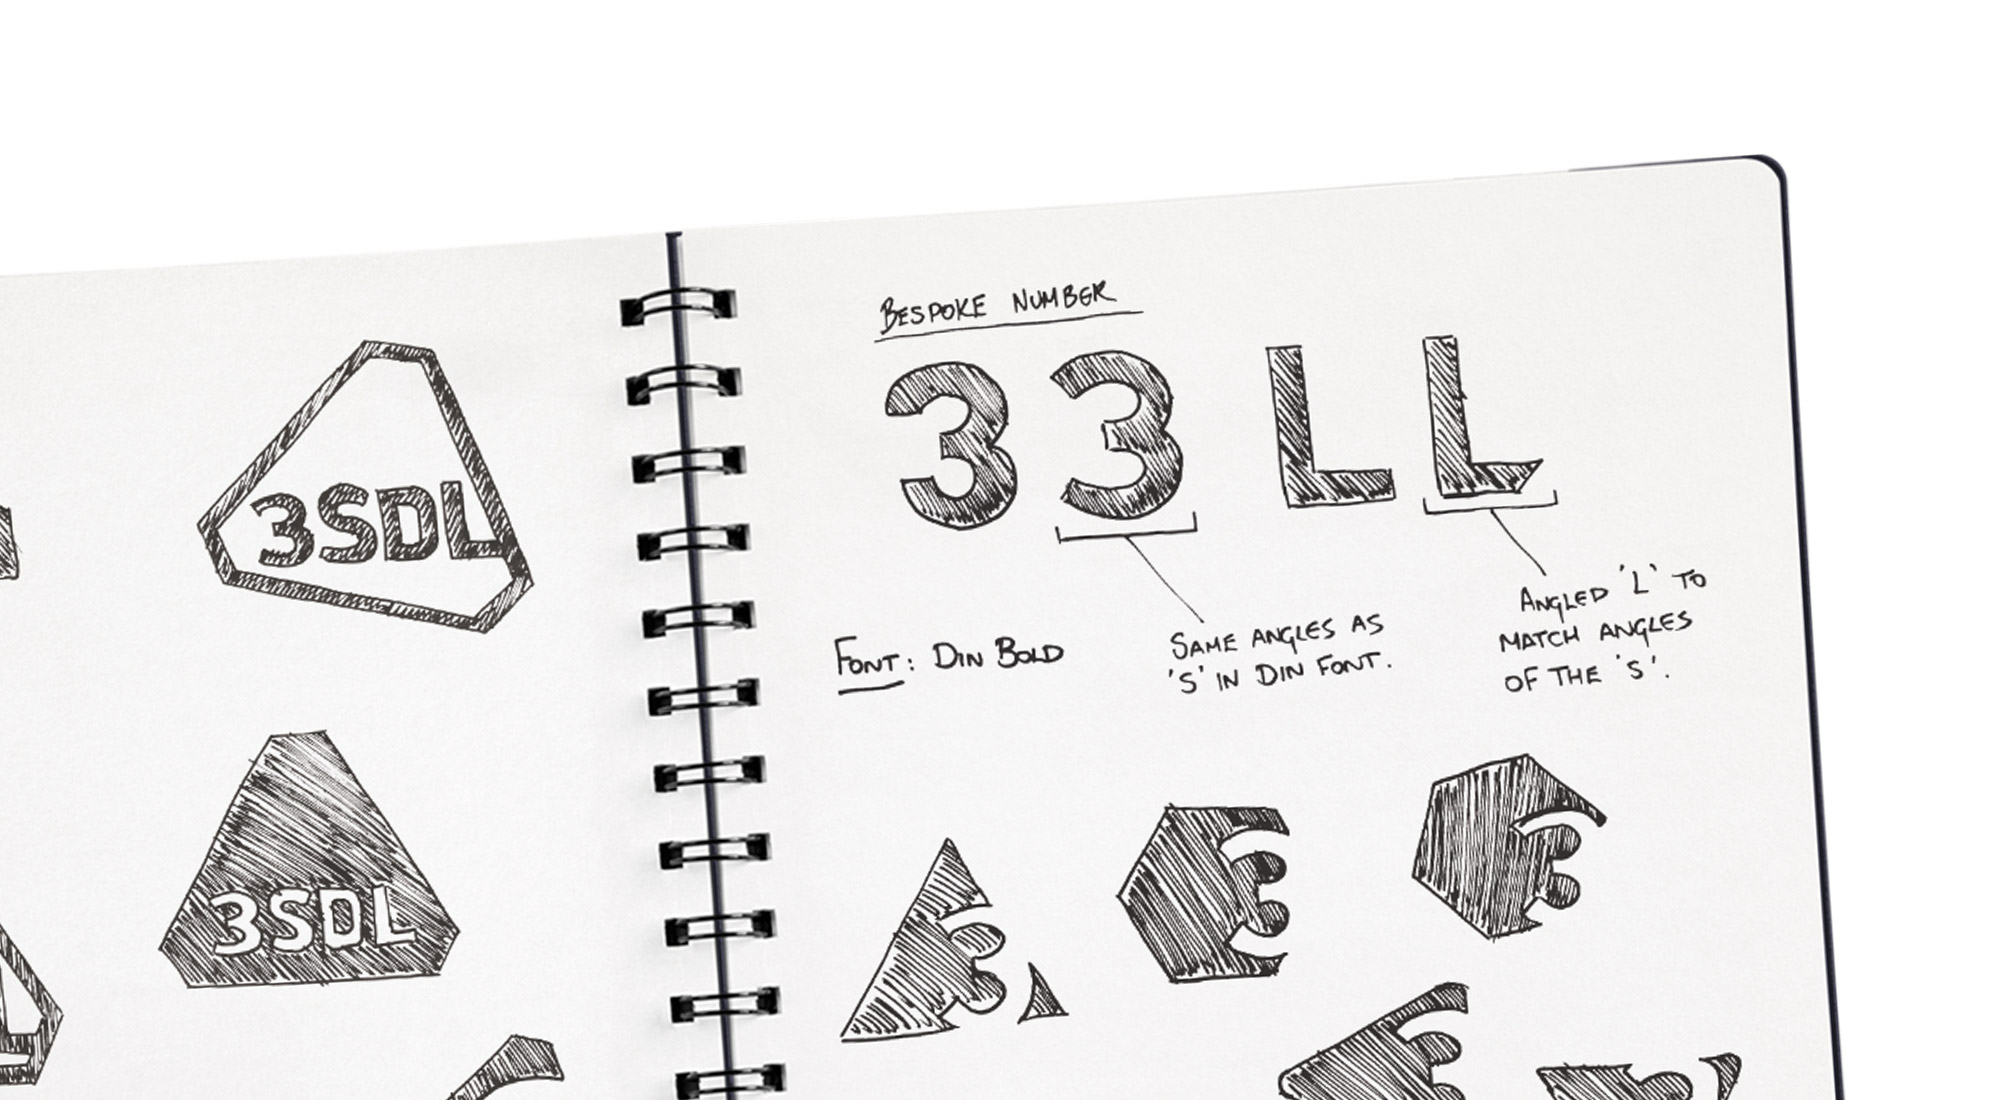 logo sketches for 3SDL